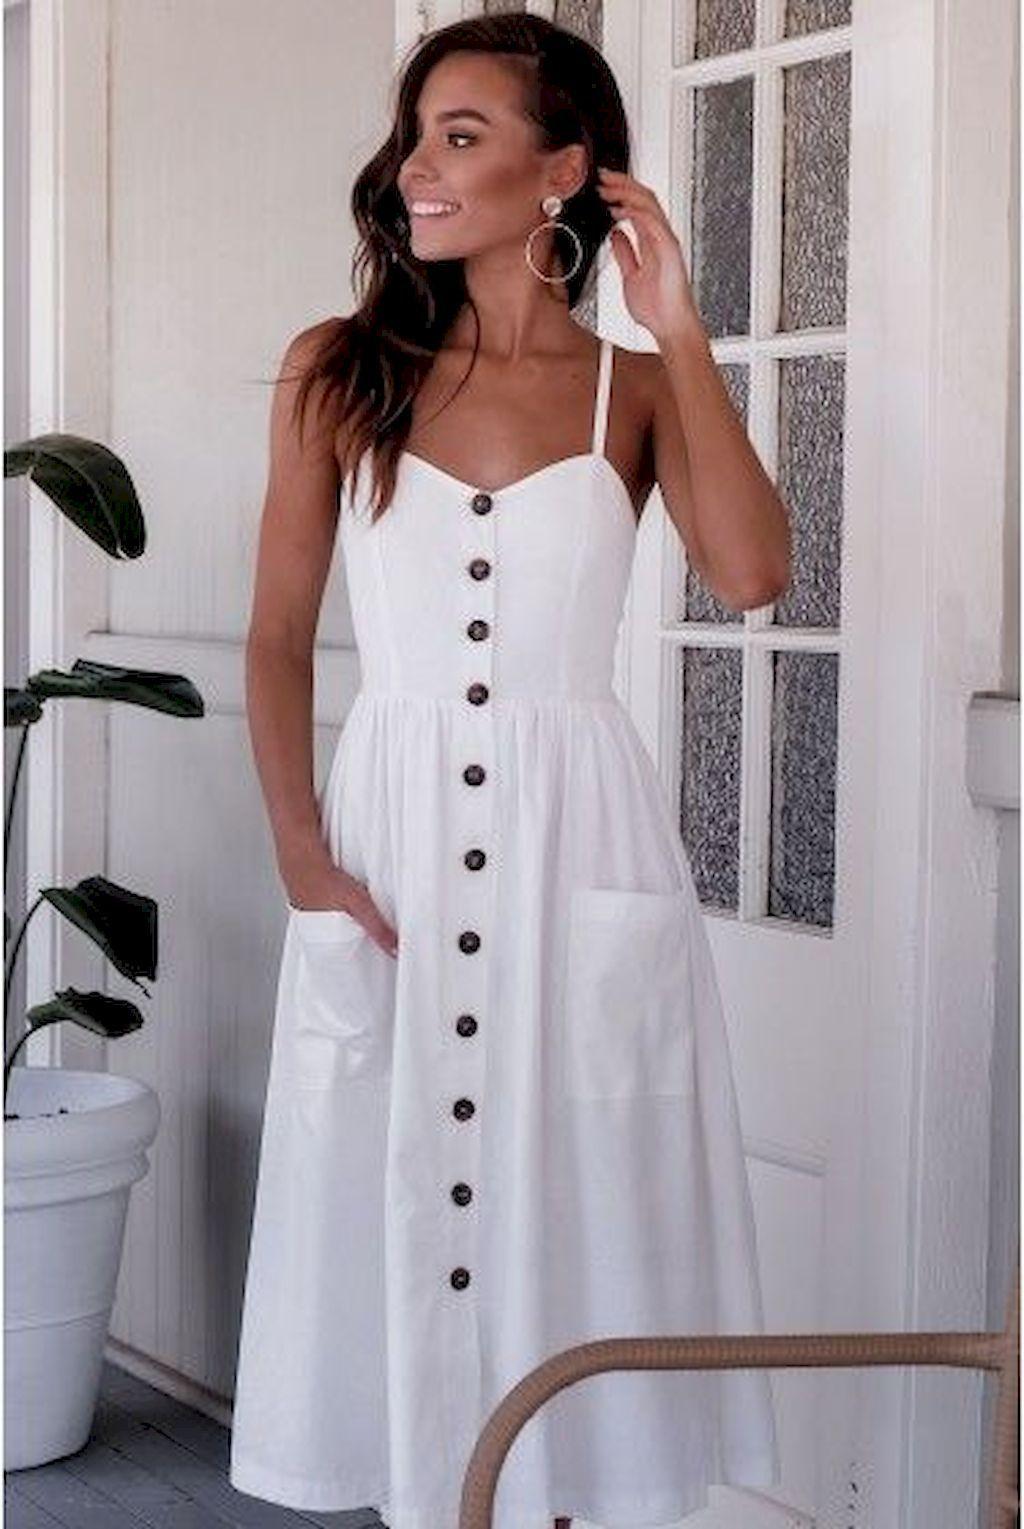 Cool 47 Beautiful Casual Dress Ideas For Women Https Bellestilo Com 3771 47 Beautiful Casual Dress Ideas For Beautiful Casual Dresses Fashion Summer Dresses [ 1529 x 1024 Pixel ]